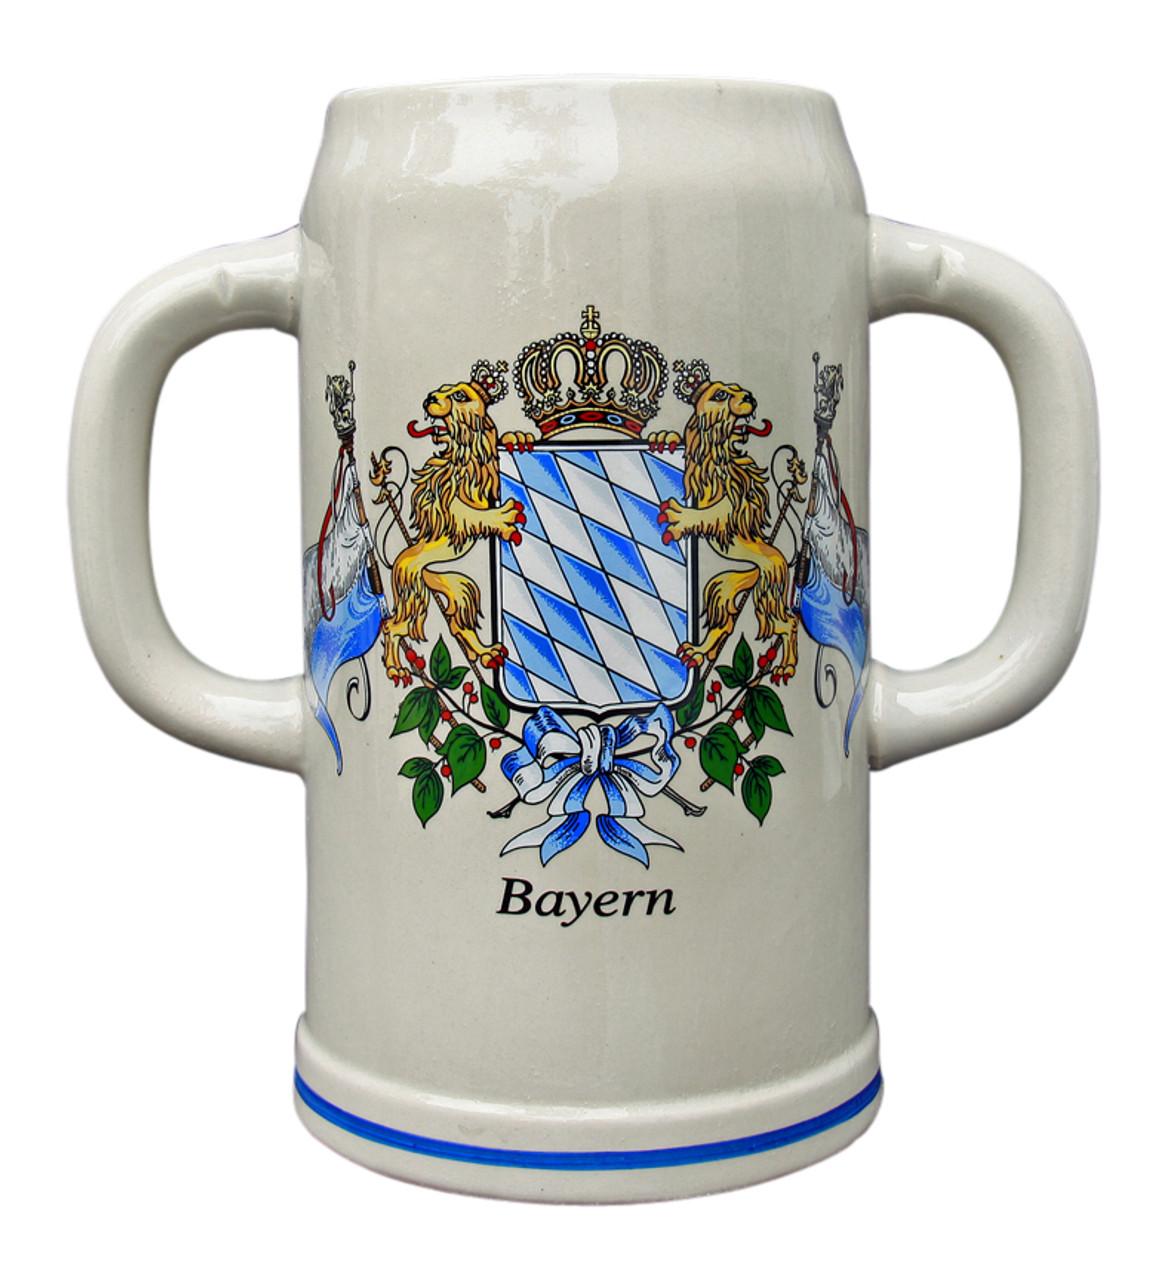 Double Handle Oktoberfest Ceramic Beer Mug